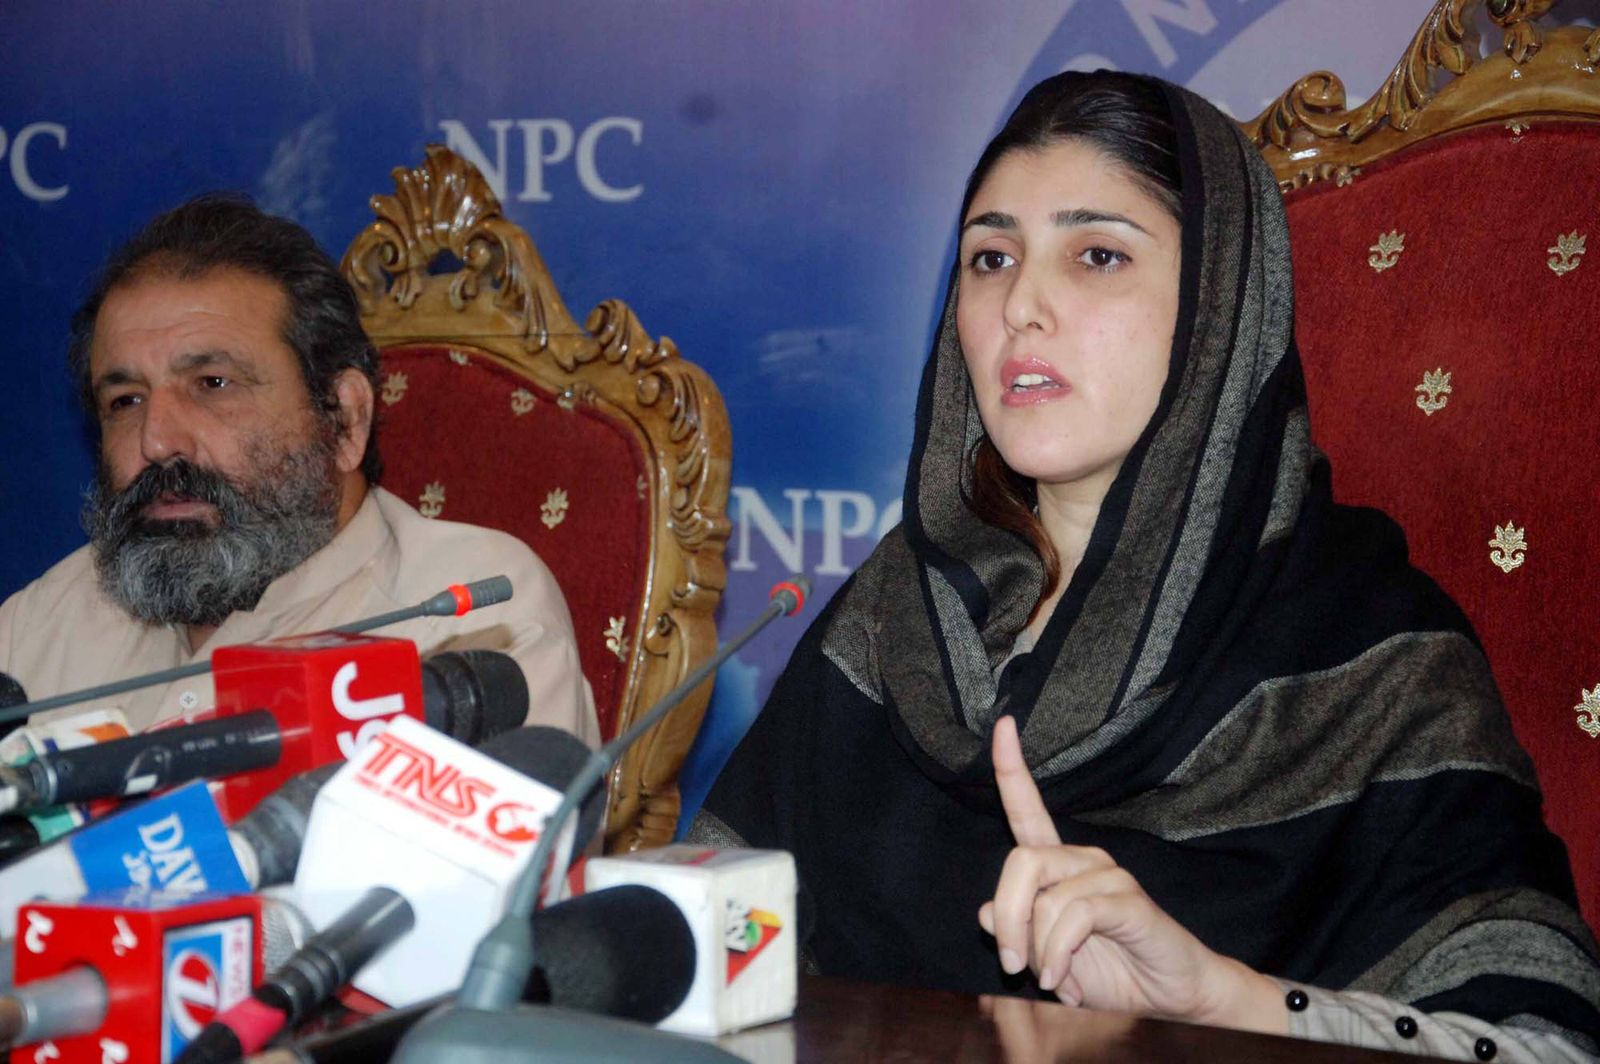 November 16 2017 Pakistan ISLAMABAD PAKISTAN NOV 15 Ayesha Gulalai Wazir addresses to media